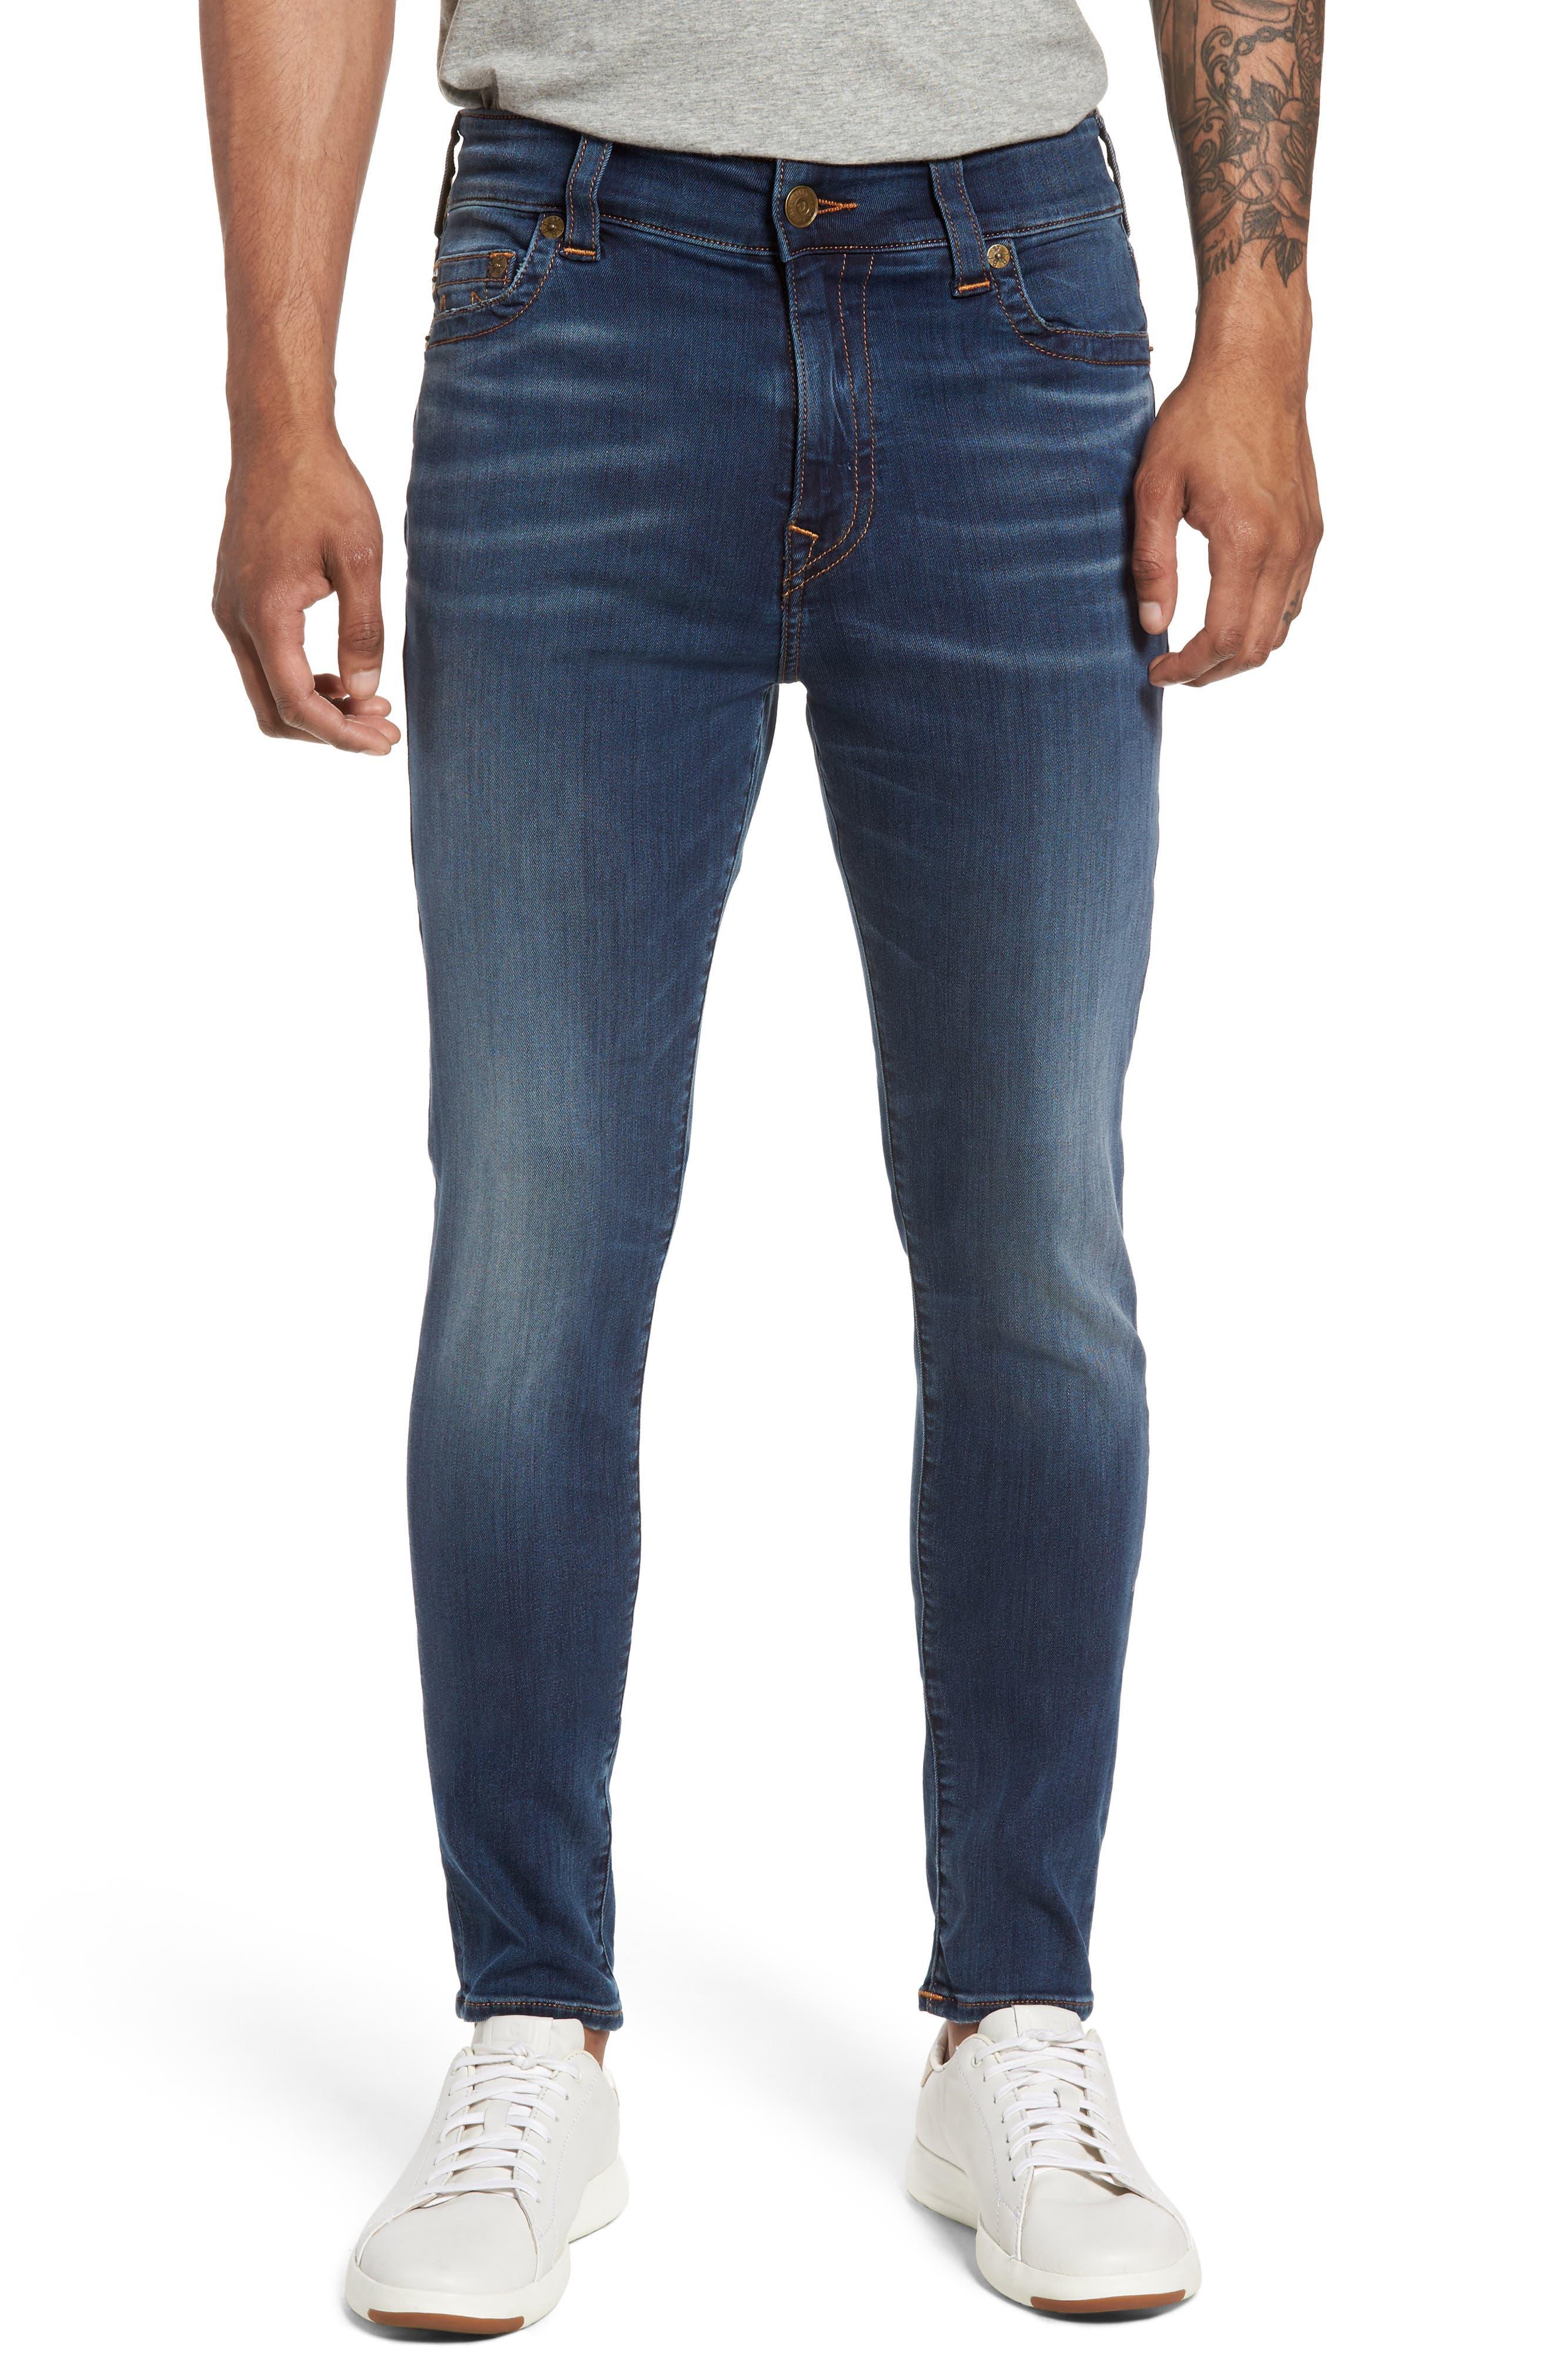 Alternate Image 1 Selected - True Religion Brand Jeans Jack Skinny Fit Jeans (Desert Highway)